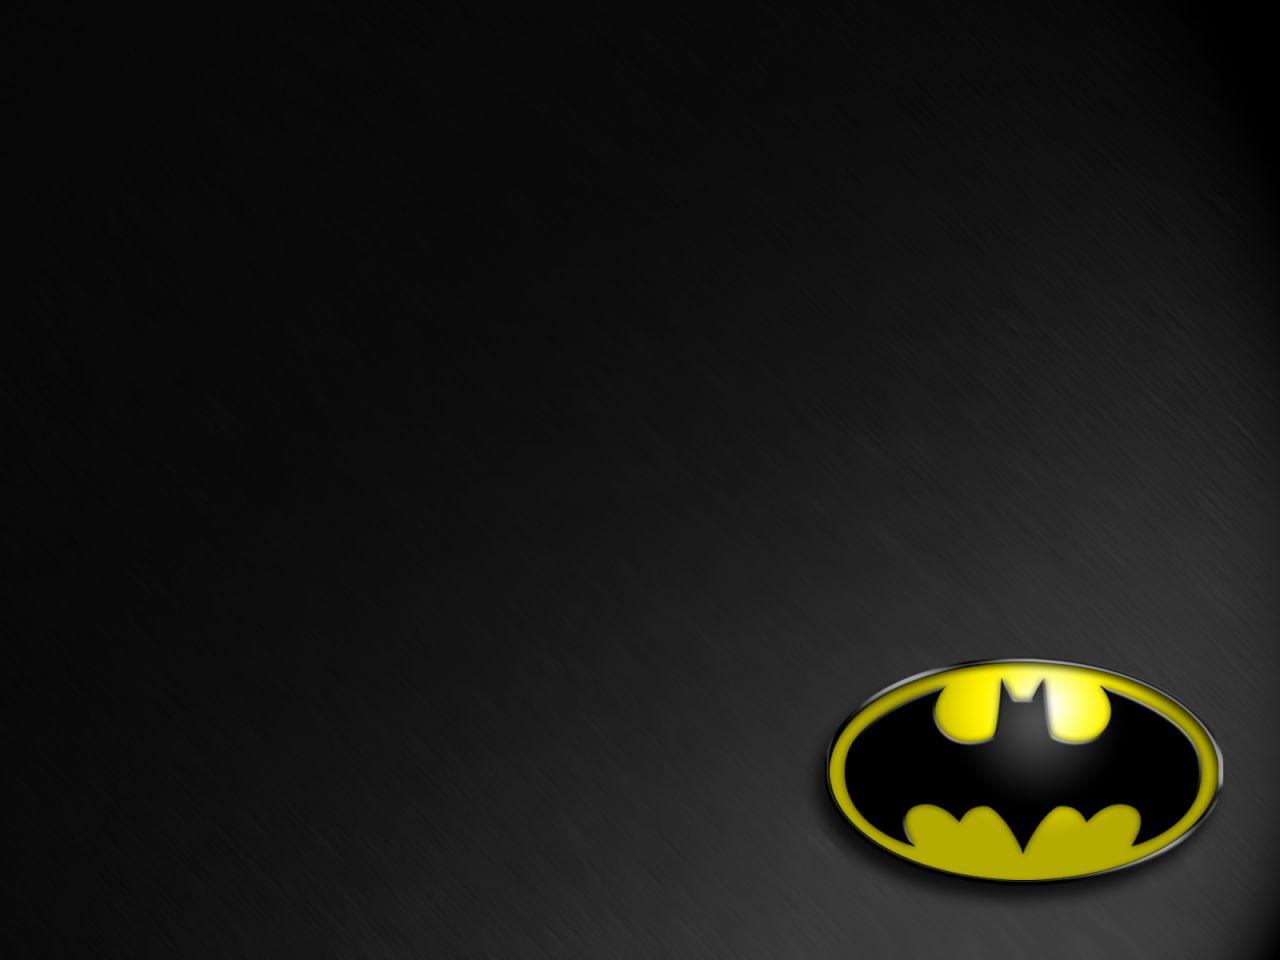 1280x960px Batman Symbol Wallpaper Wallpapersafari